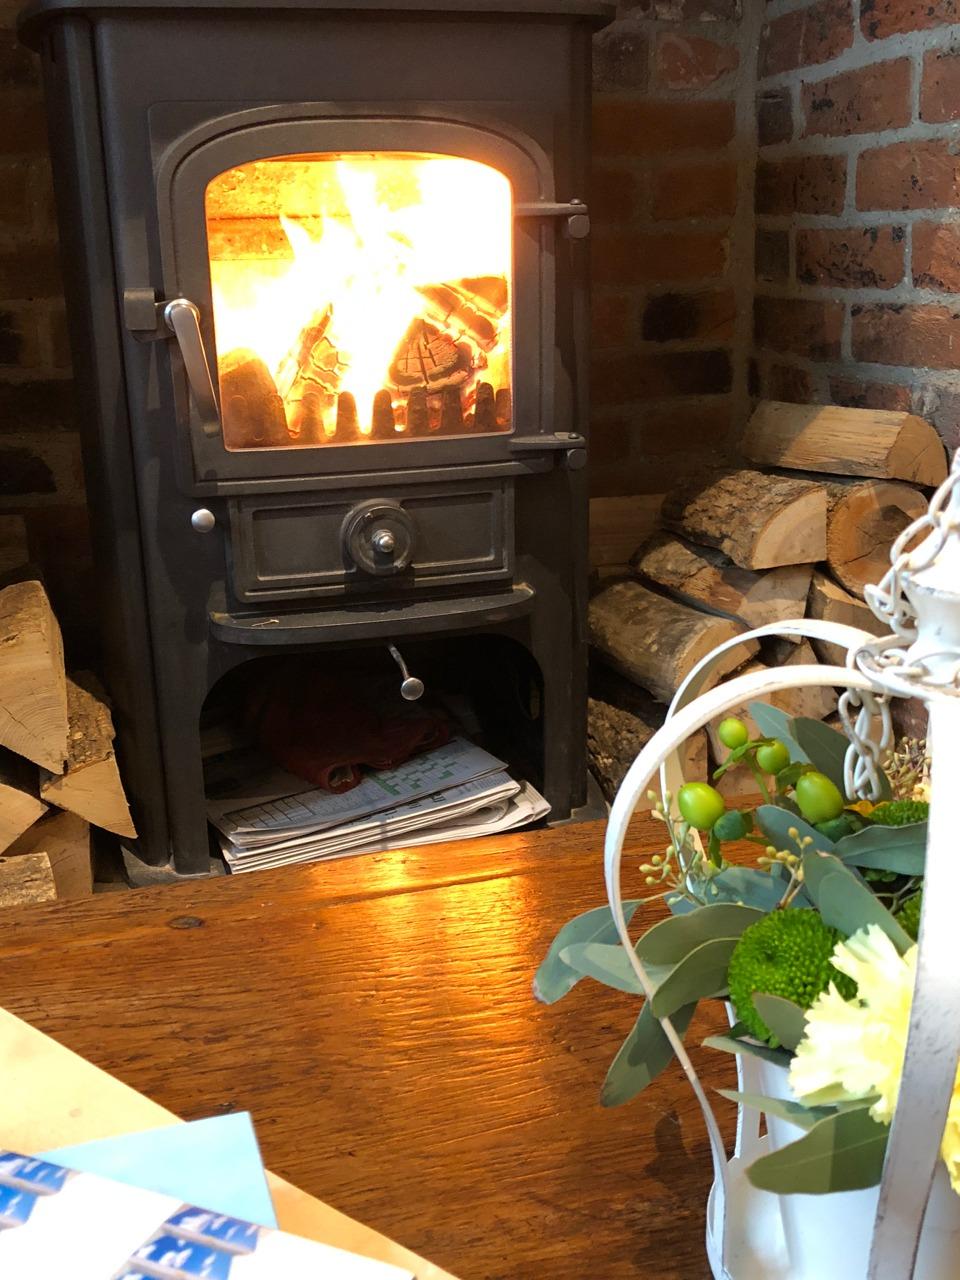 wood burning stove Hurley House Hotel - Jenography